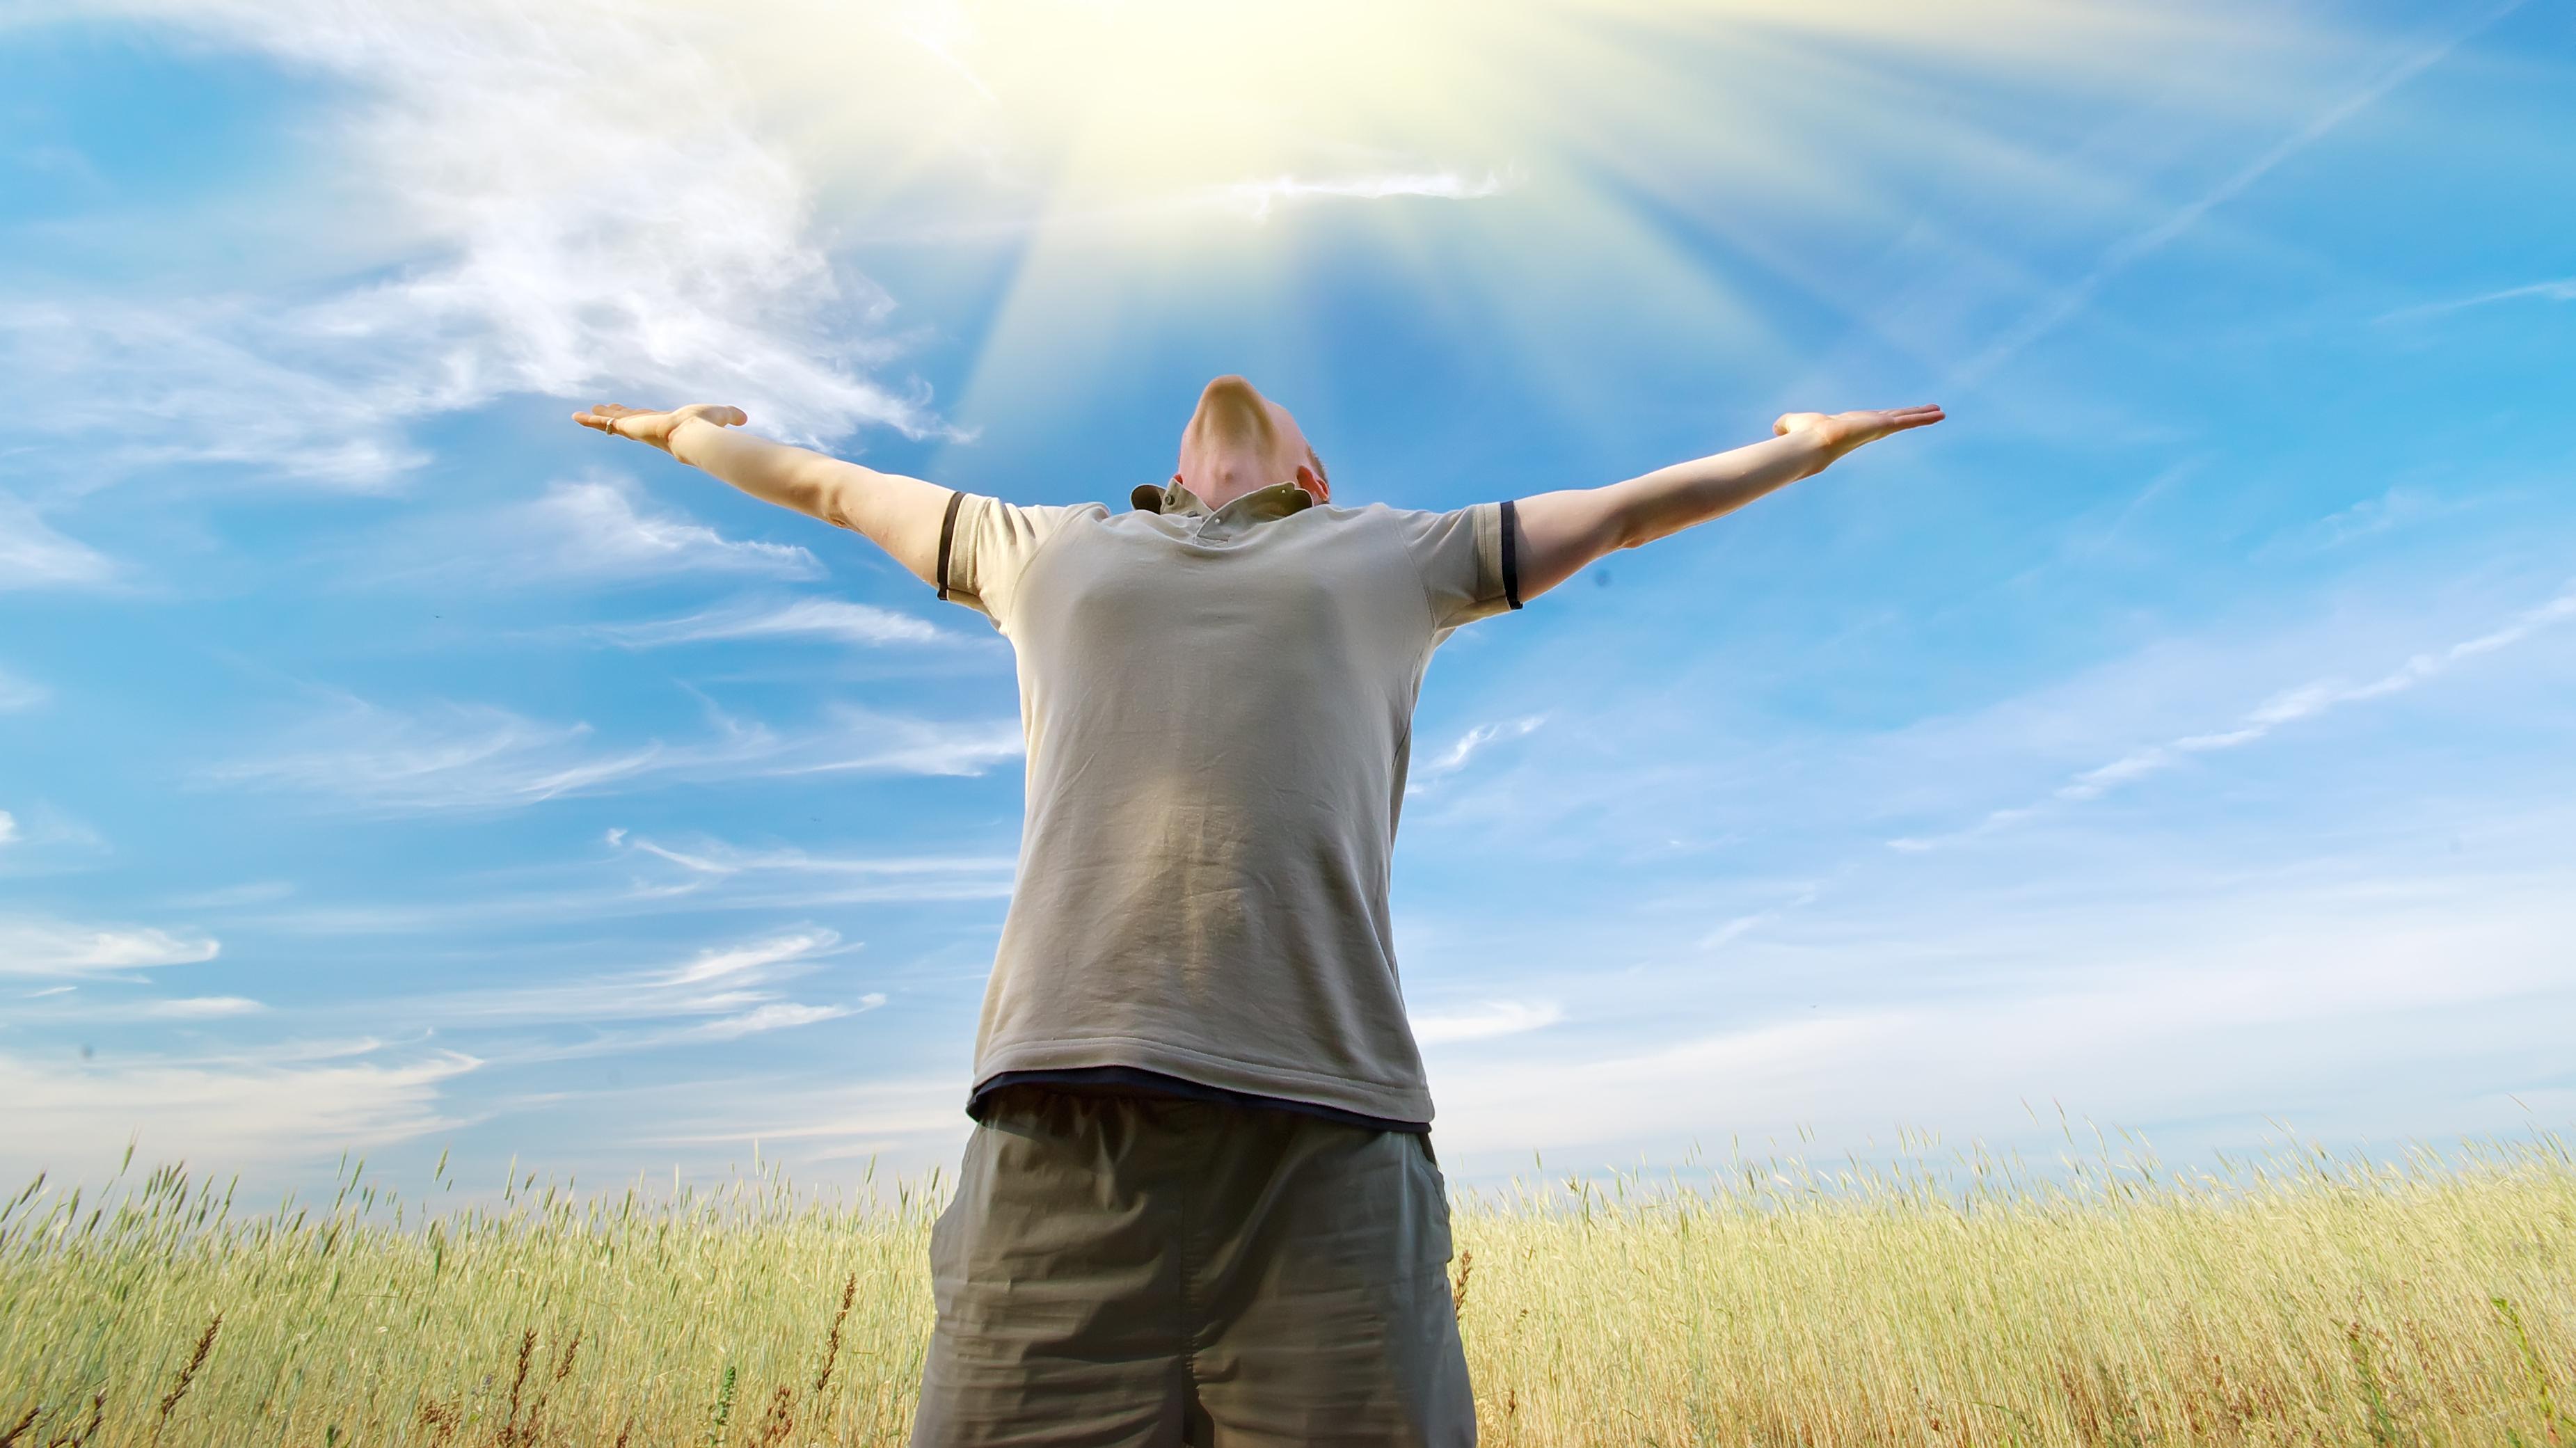 Учителя: Бог ви е пратил в света и за вас иде голямо благо